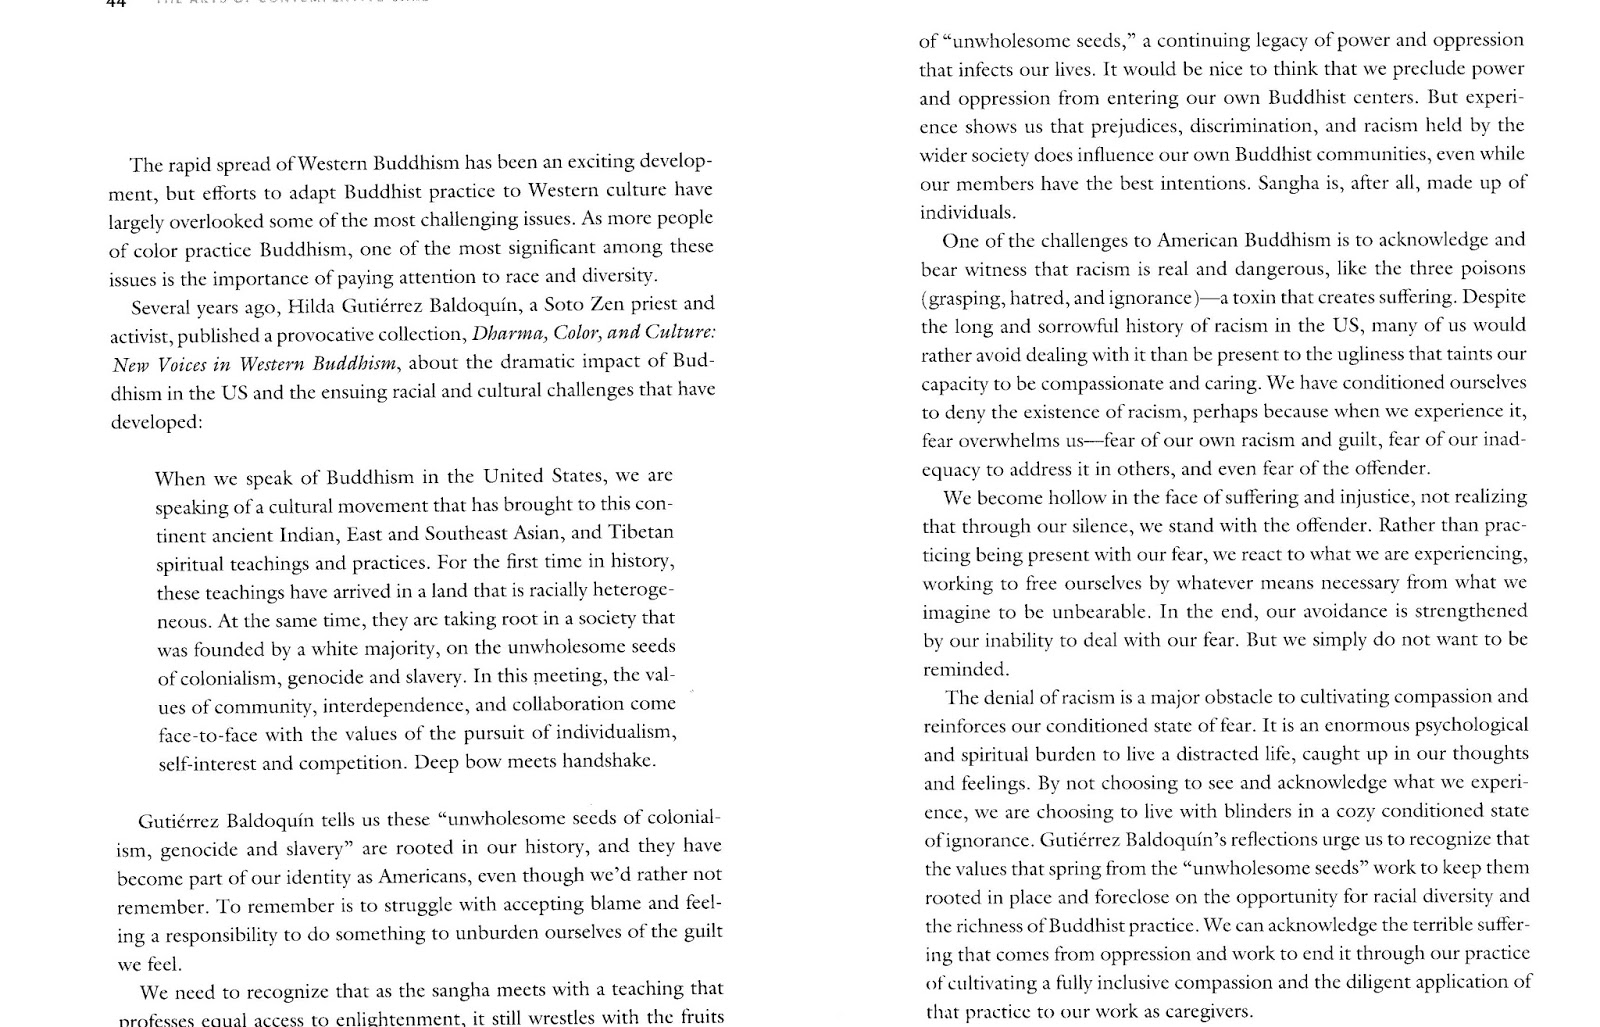 Buy custom argumentative essay on founding fathers